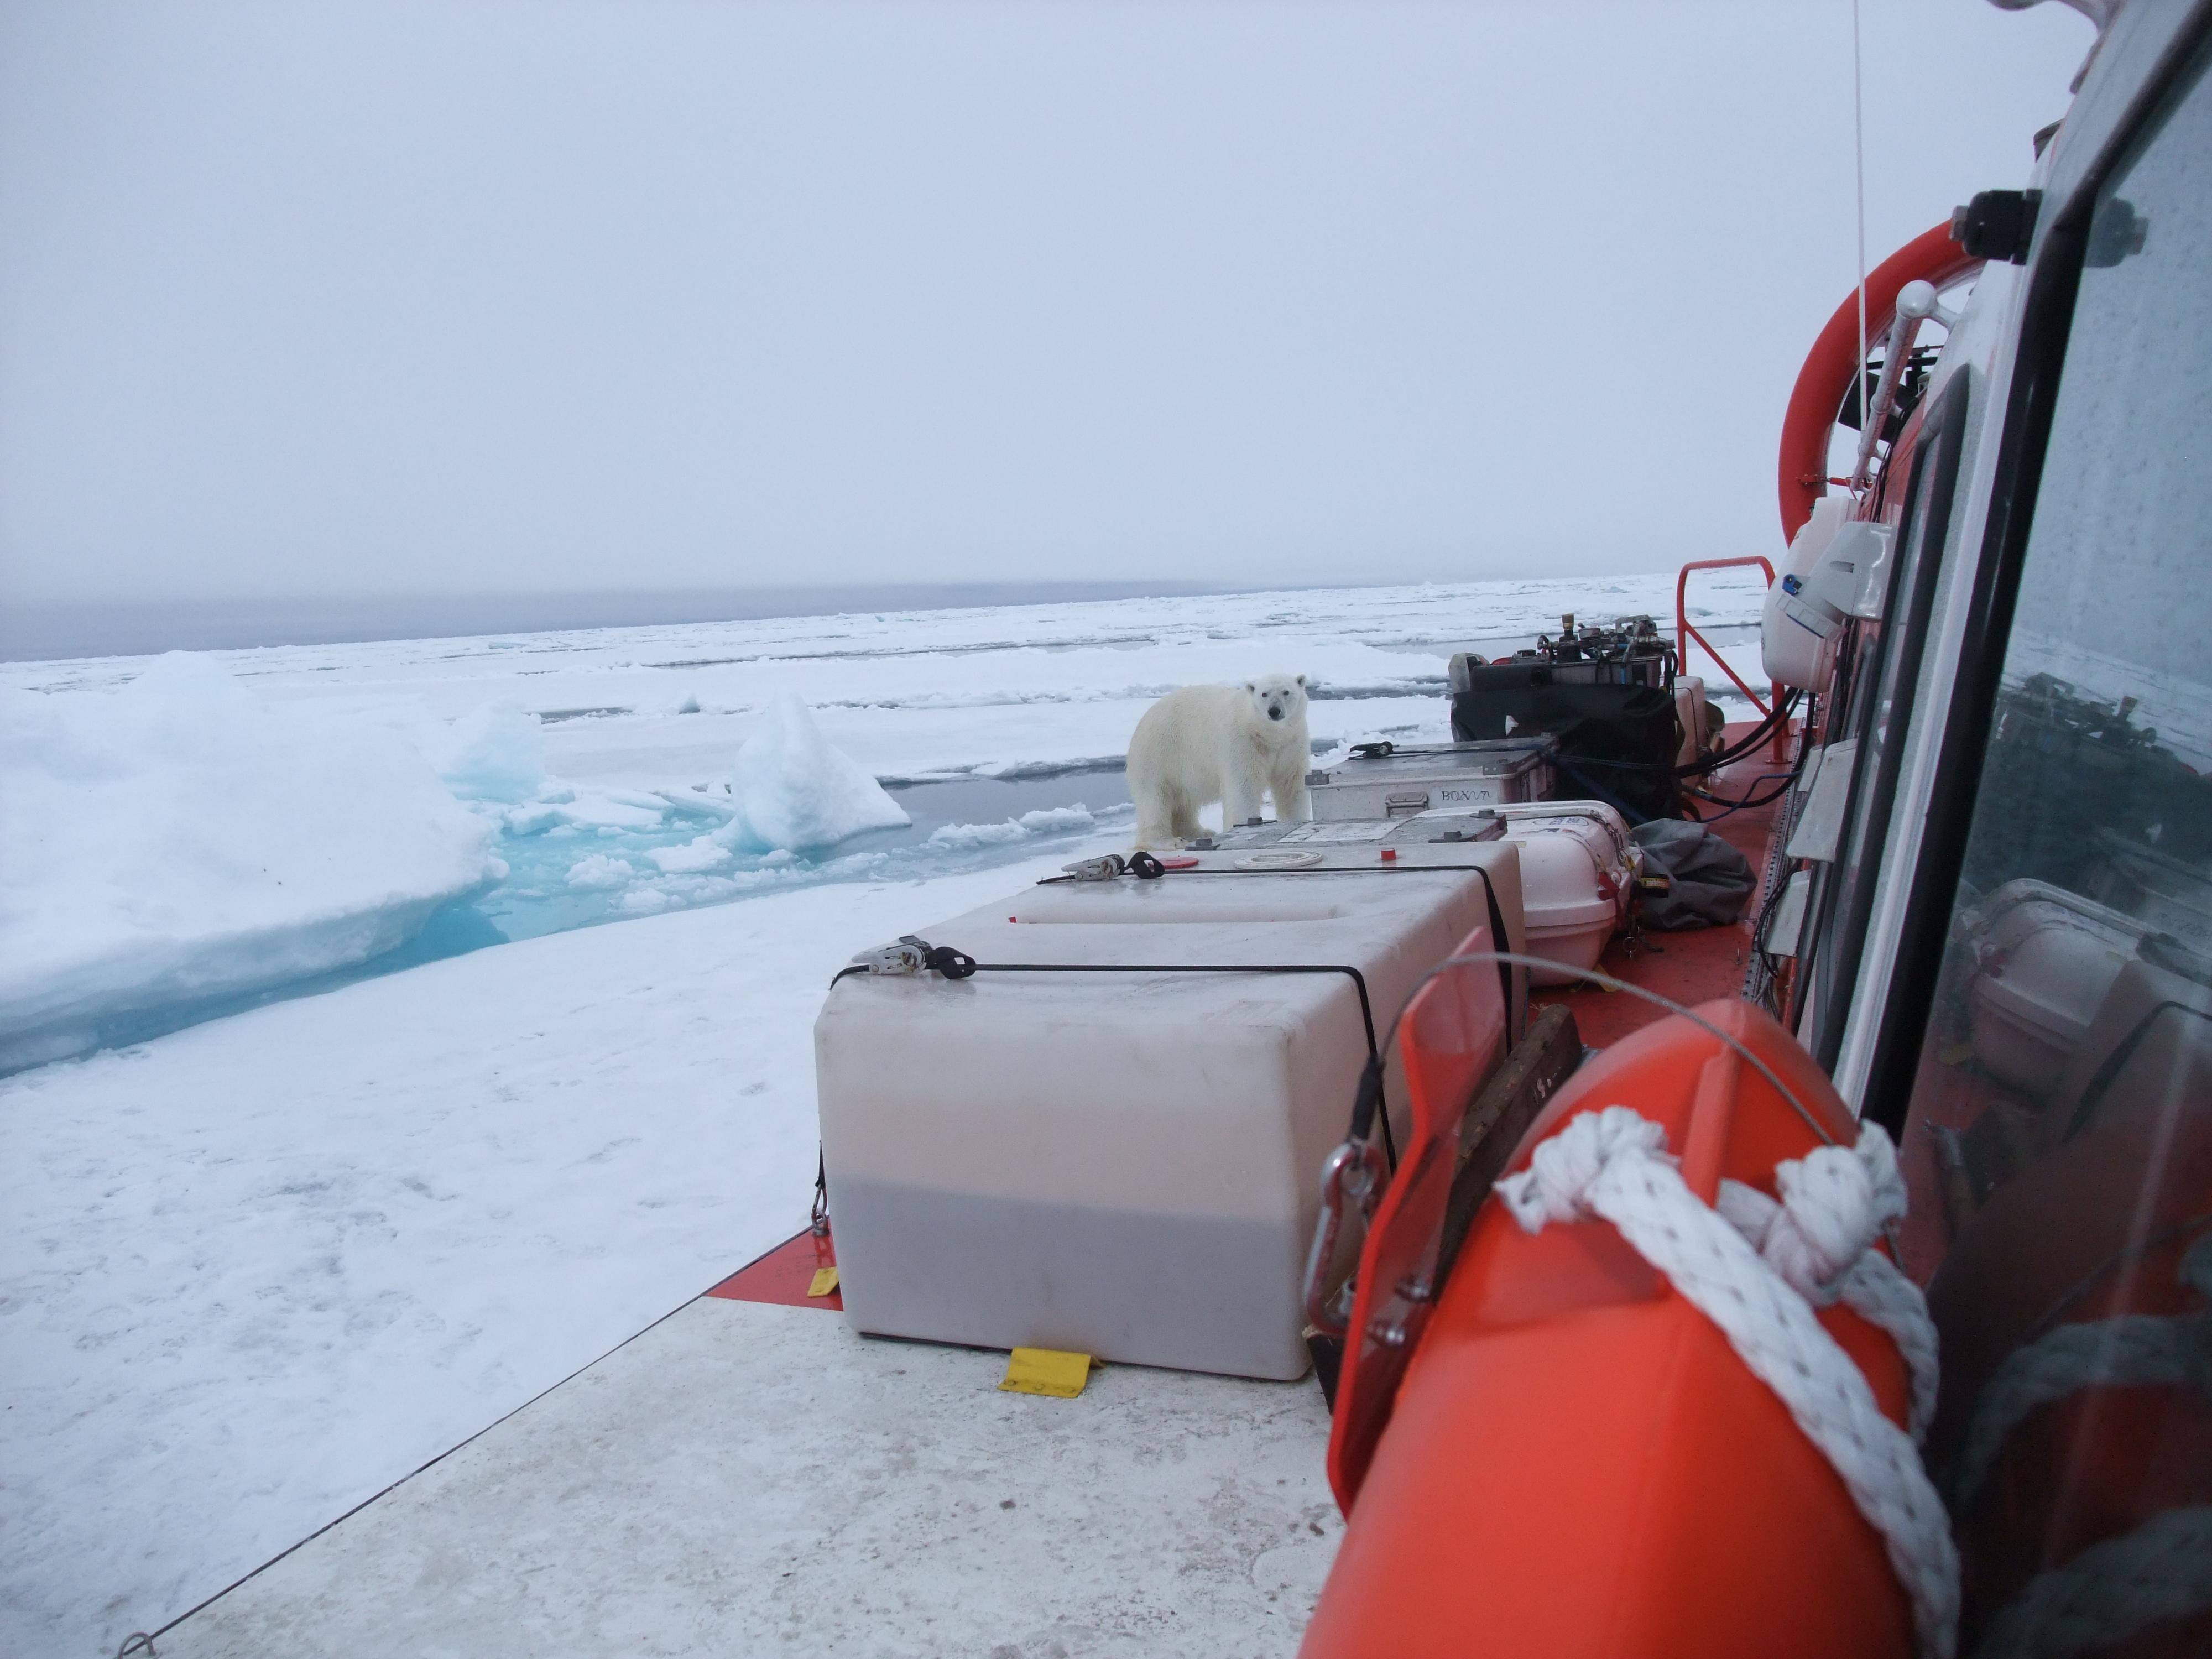 Polarbear Hovercraft Travel